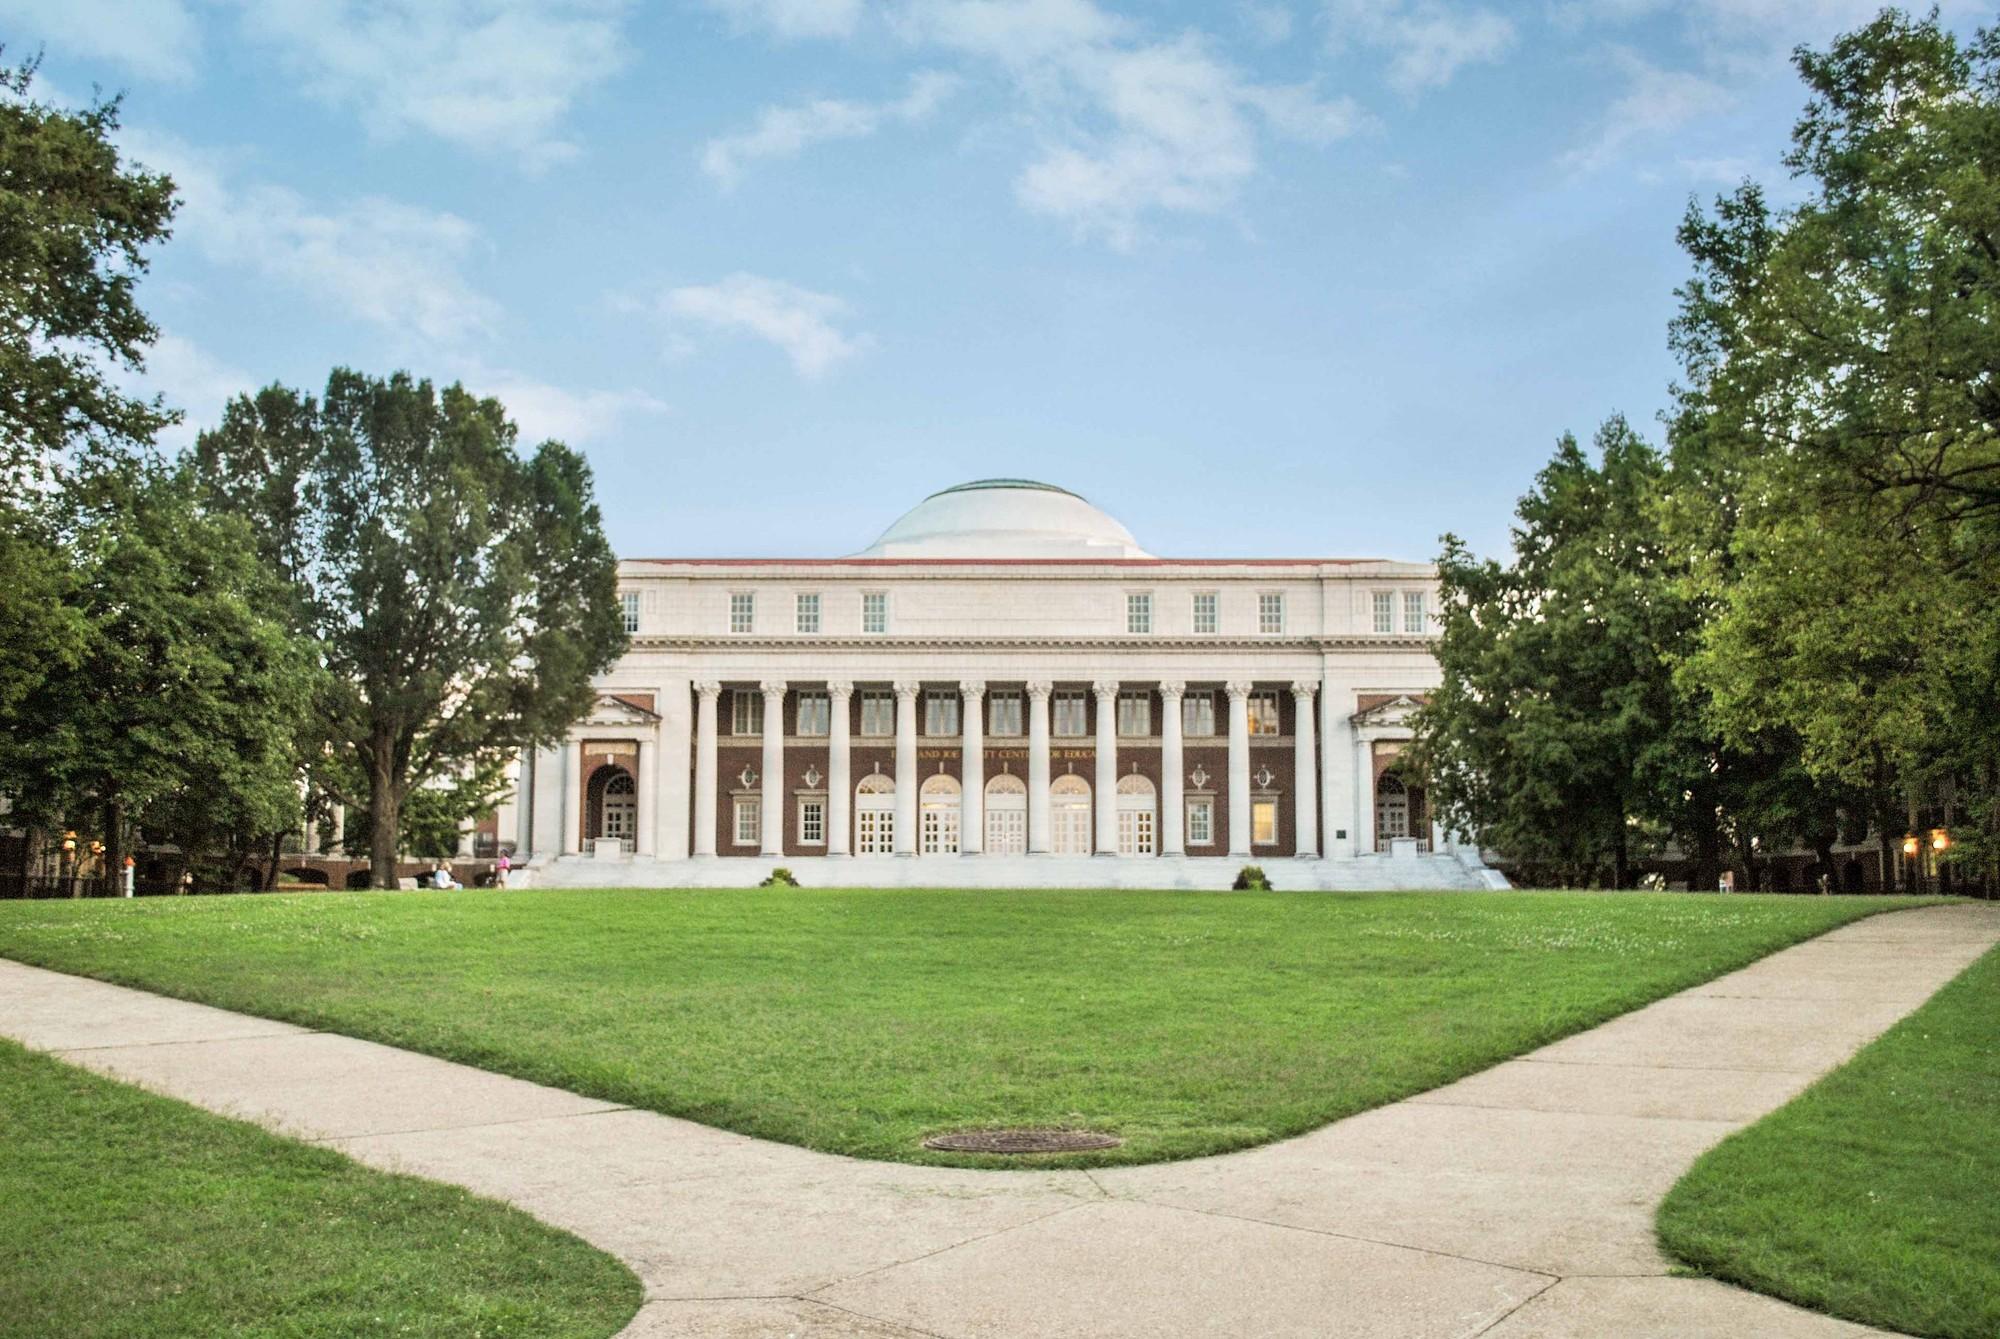 Quad entrance to Peabody College's Wyatt Center on the Vanderbilt University campus